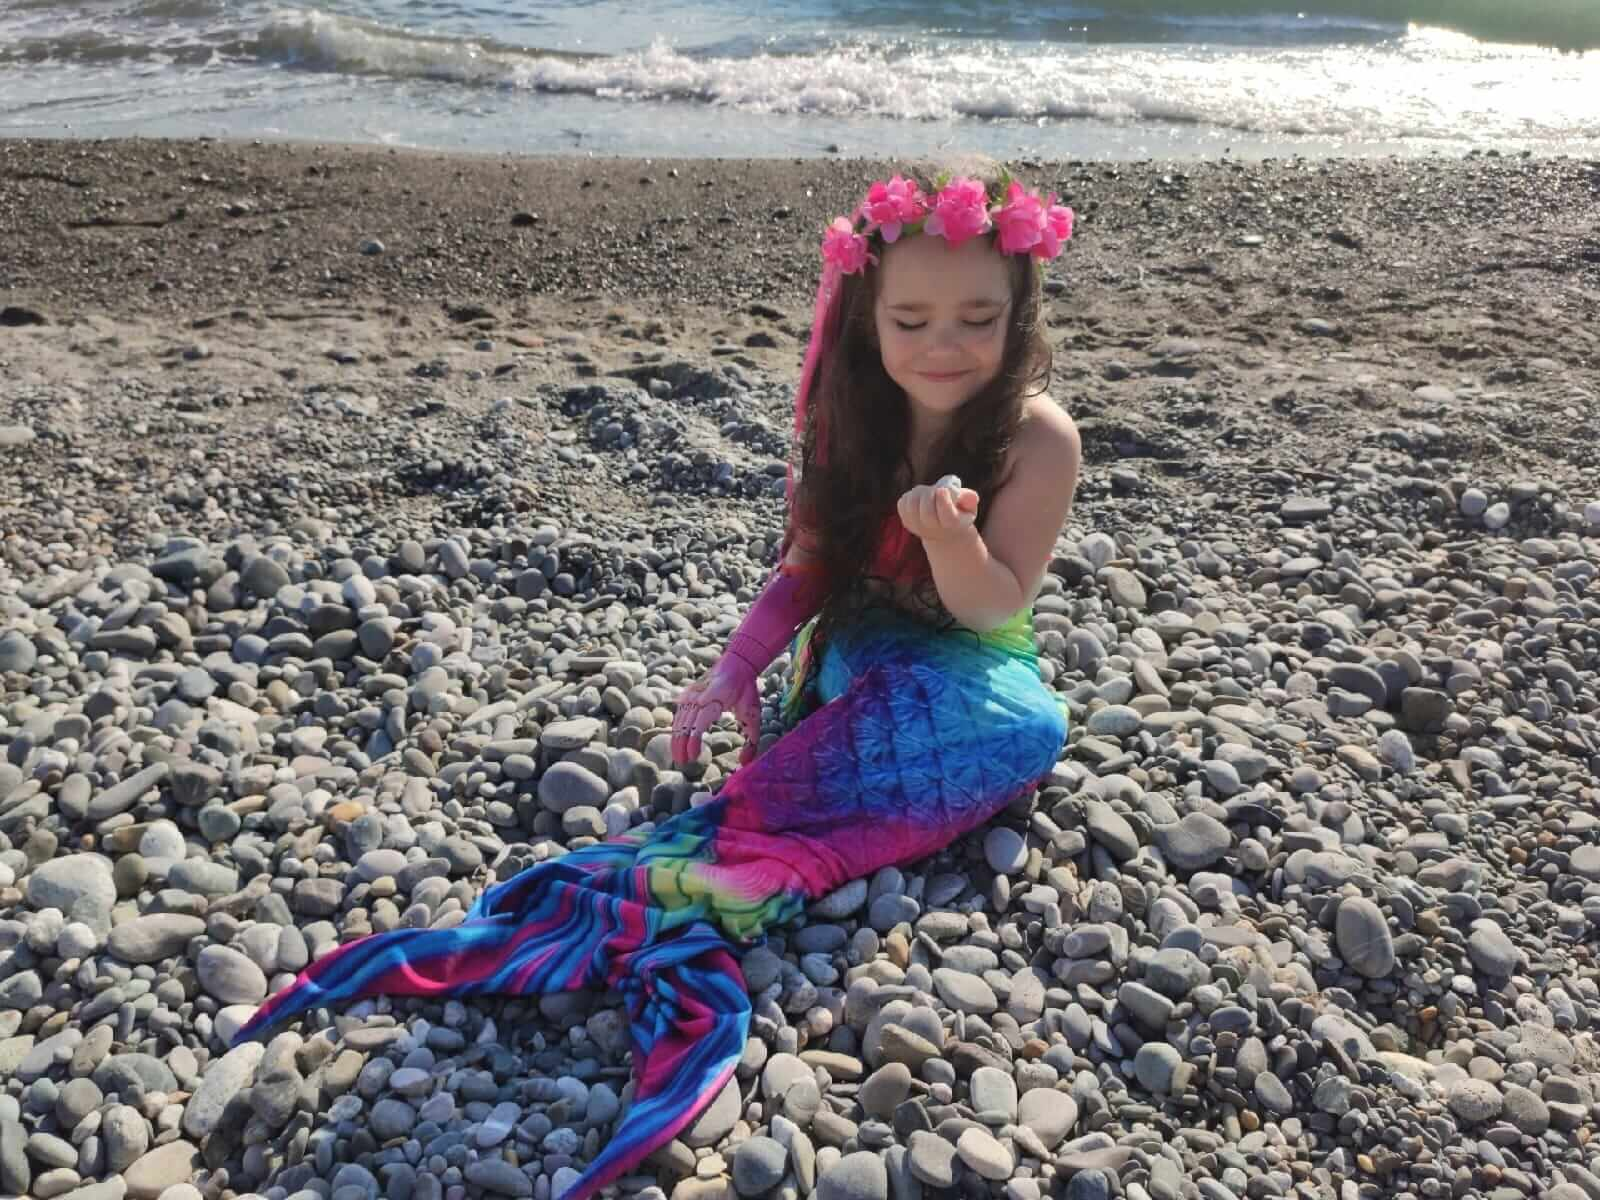 Мама киби-героини: «Я не прячу свою дочь»